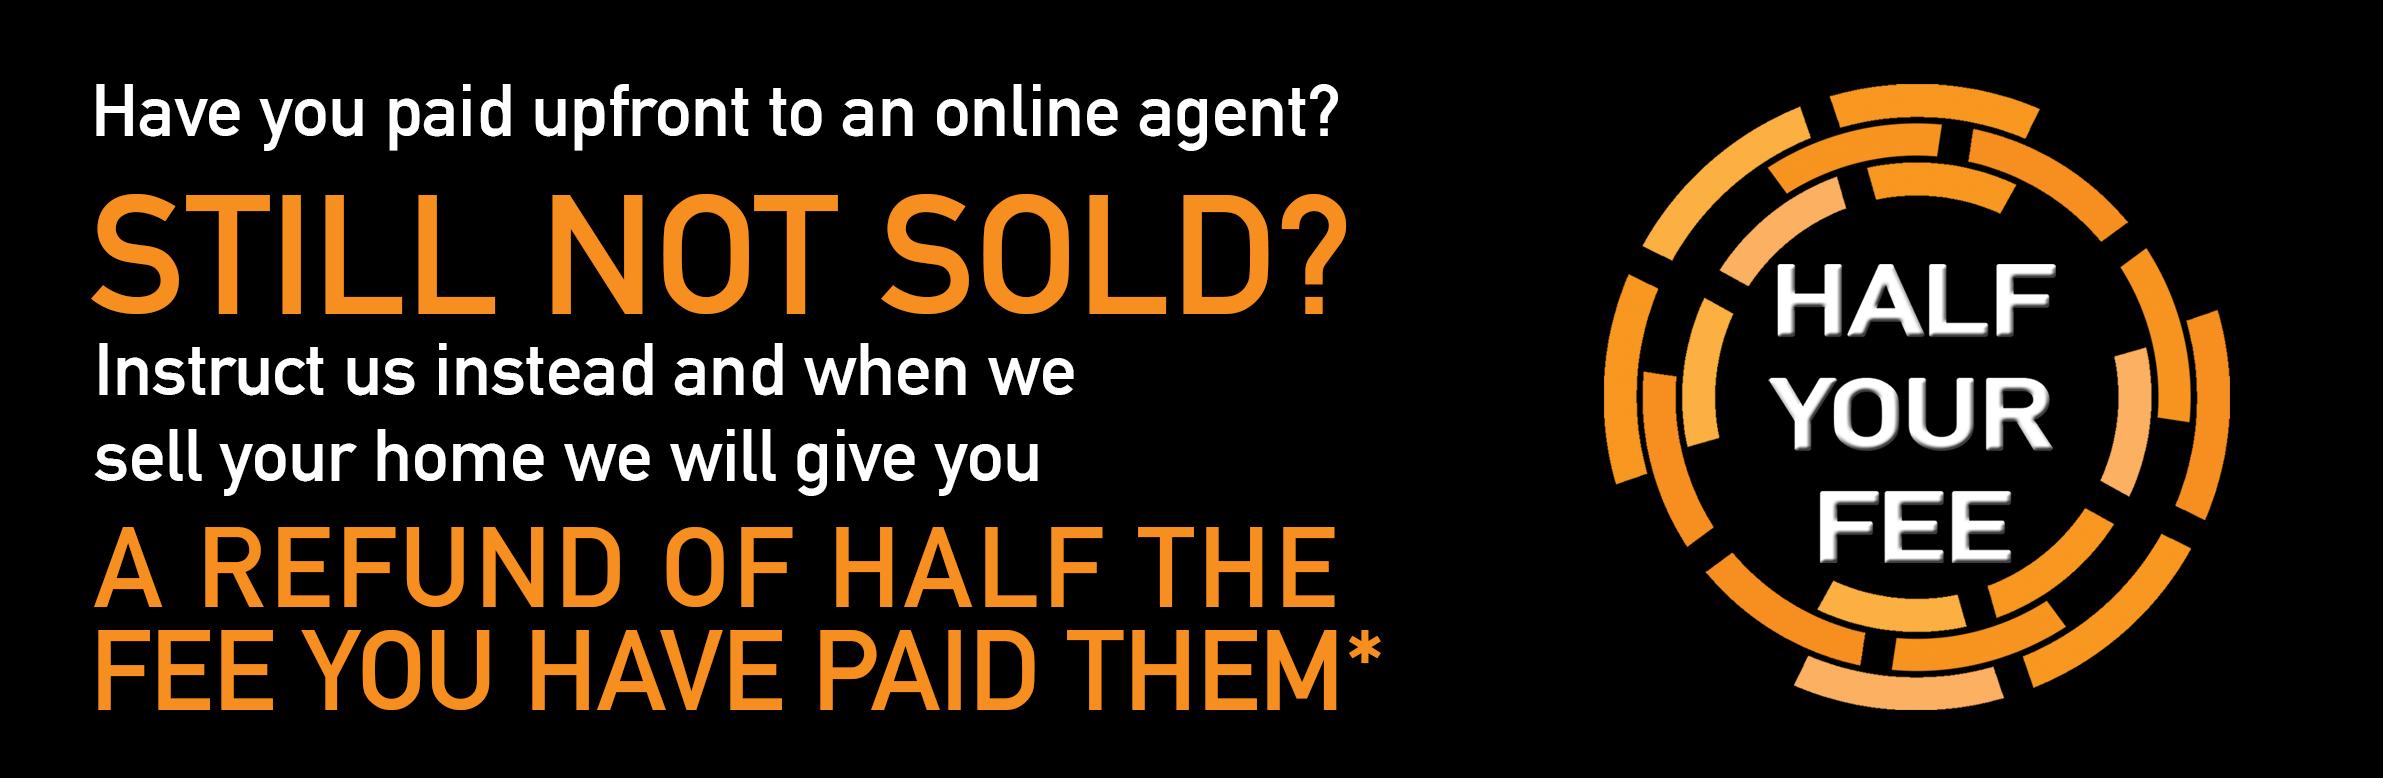 online-fee